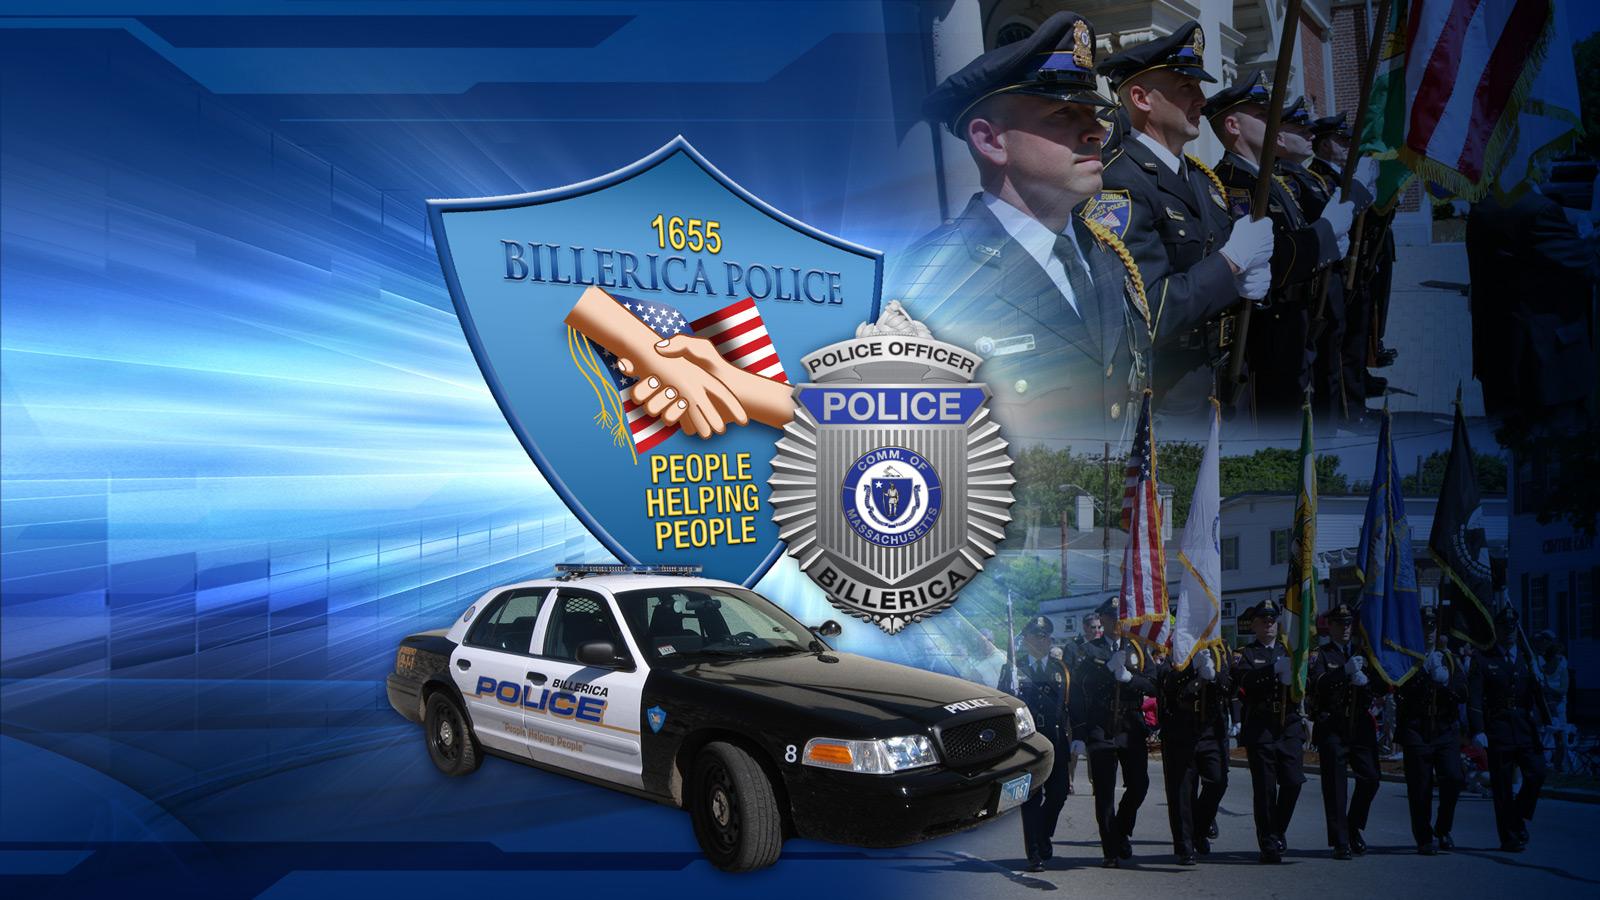 Desktop Wallpaper Billerica Police MA 1600x900